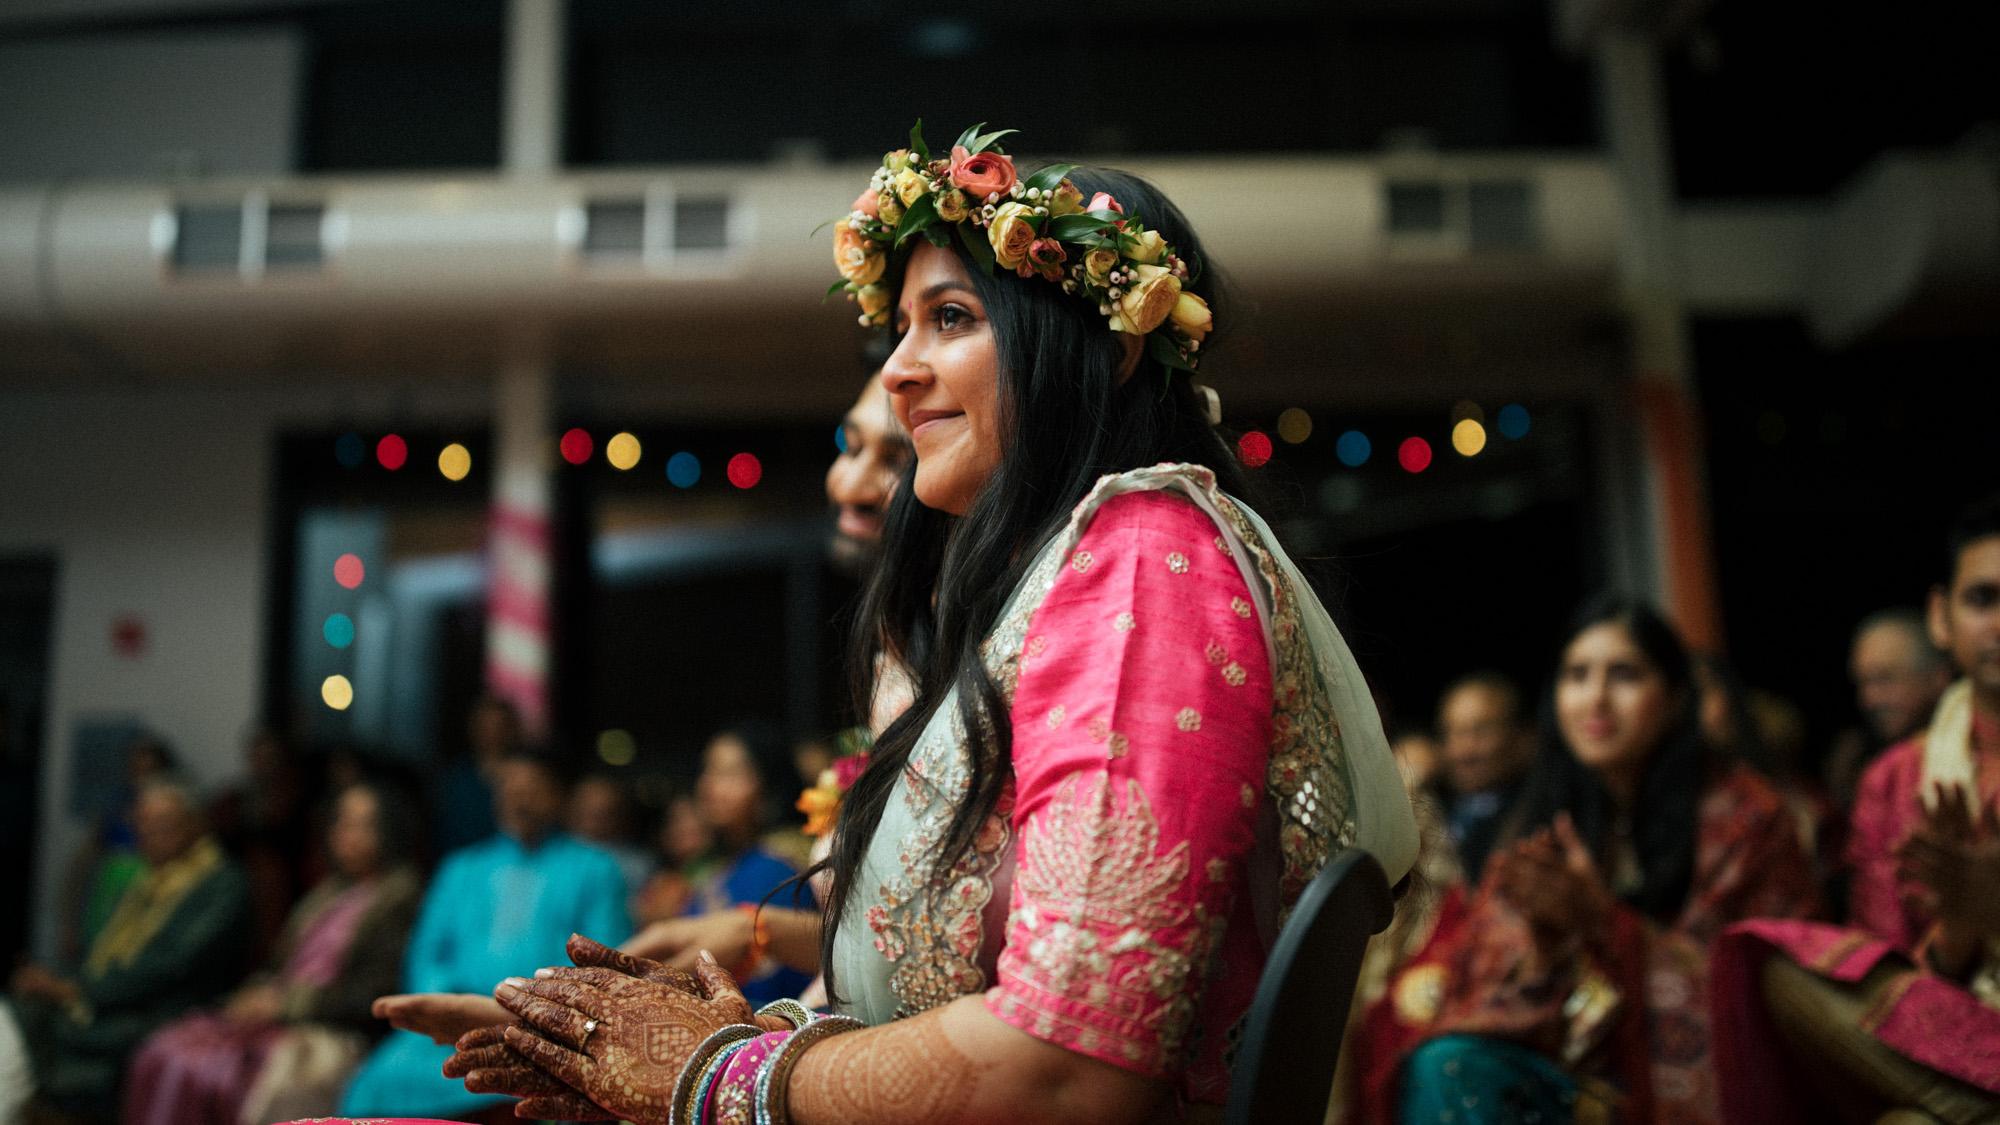 anu_maneesh_alec_vanderboom_Indian_wedding_photography-0037.jpg